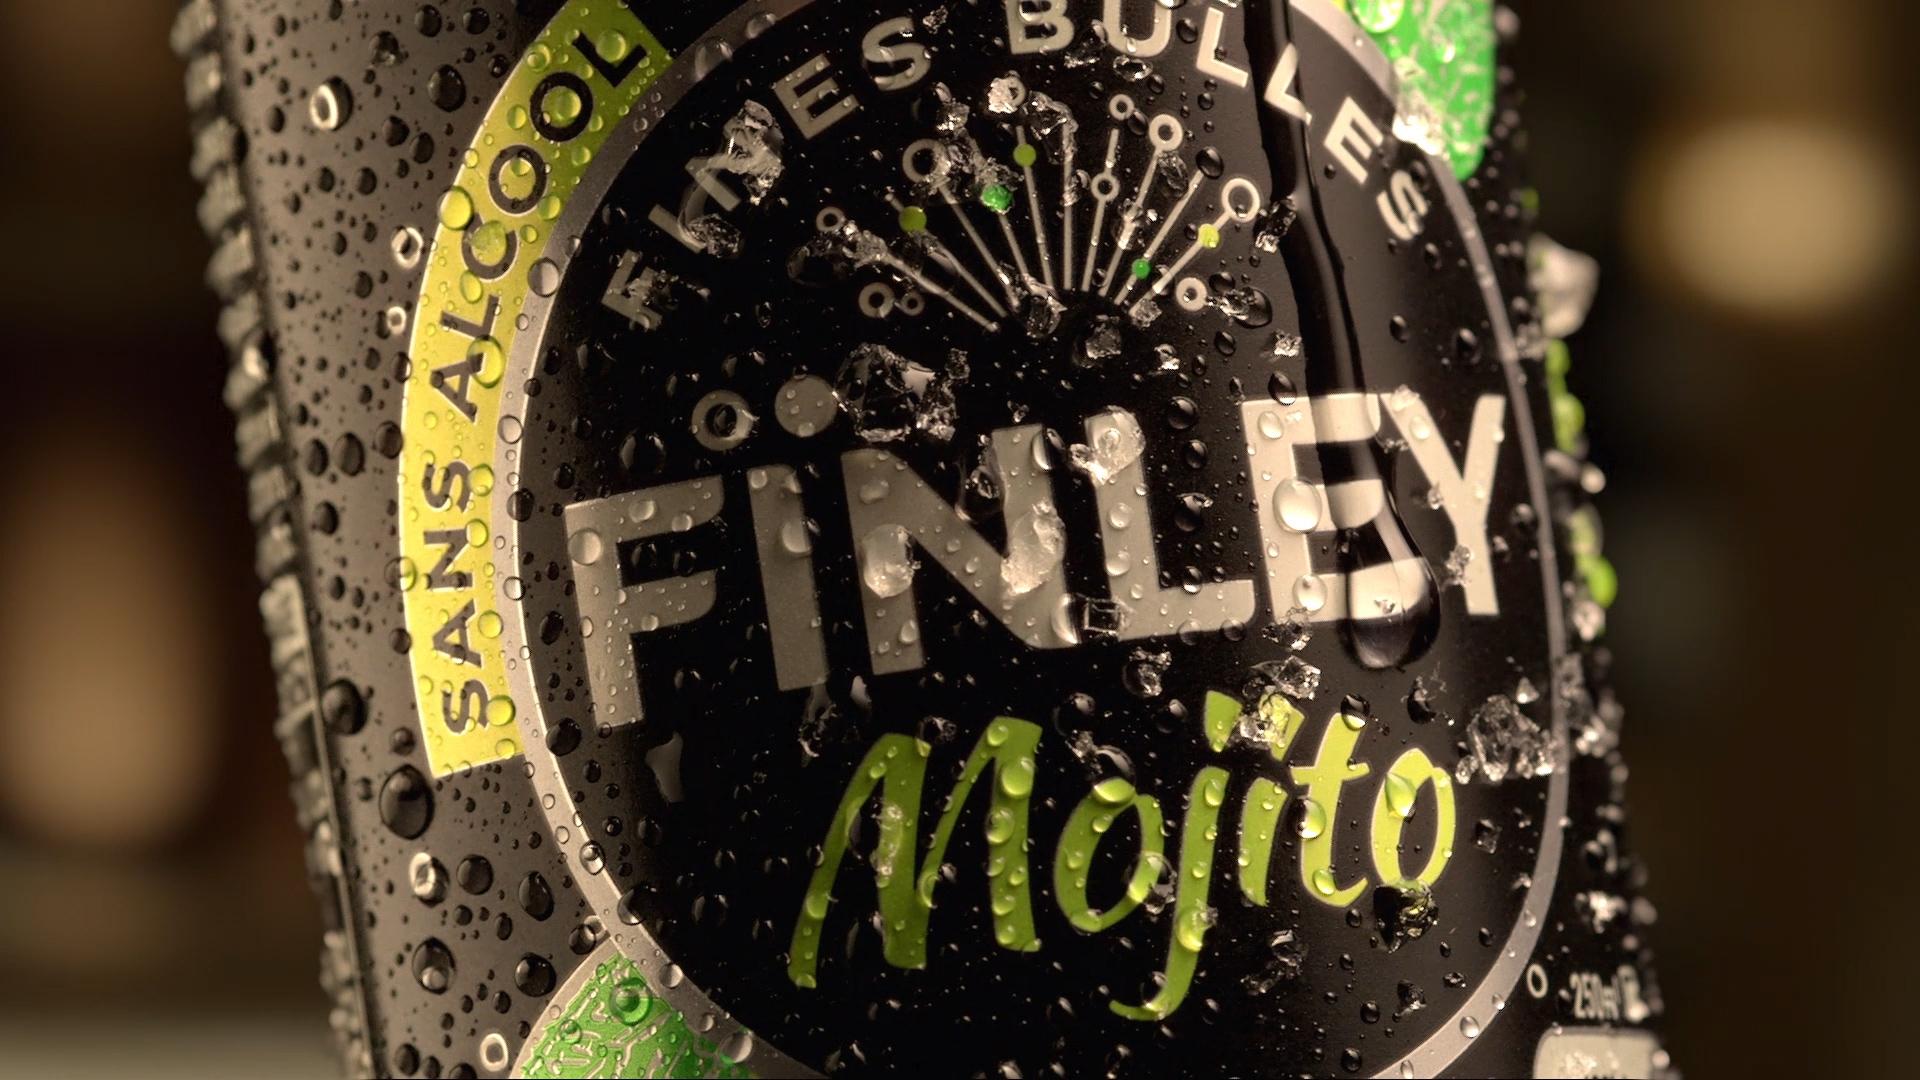 SLOW STUDIO// Finley Mojito - Won(d)er / Pablo Hermida / Slow Studio (Product)